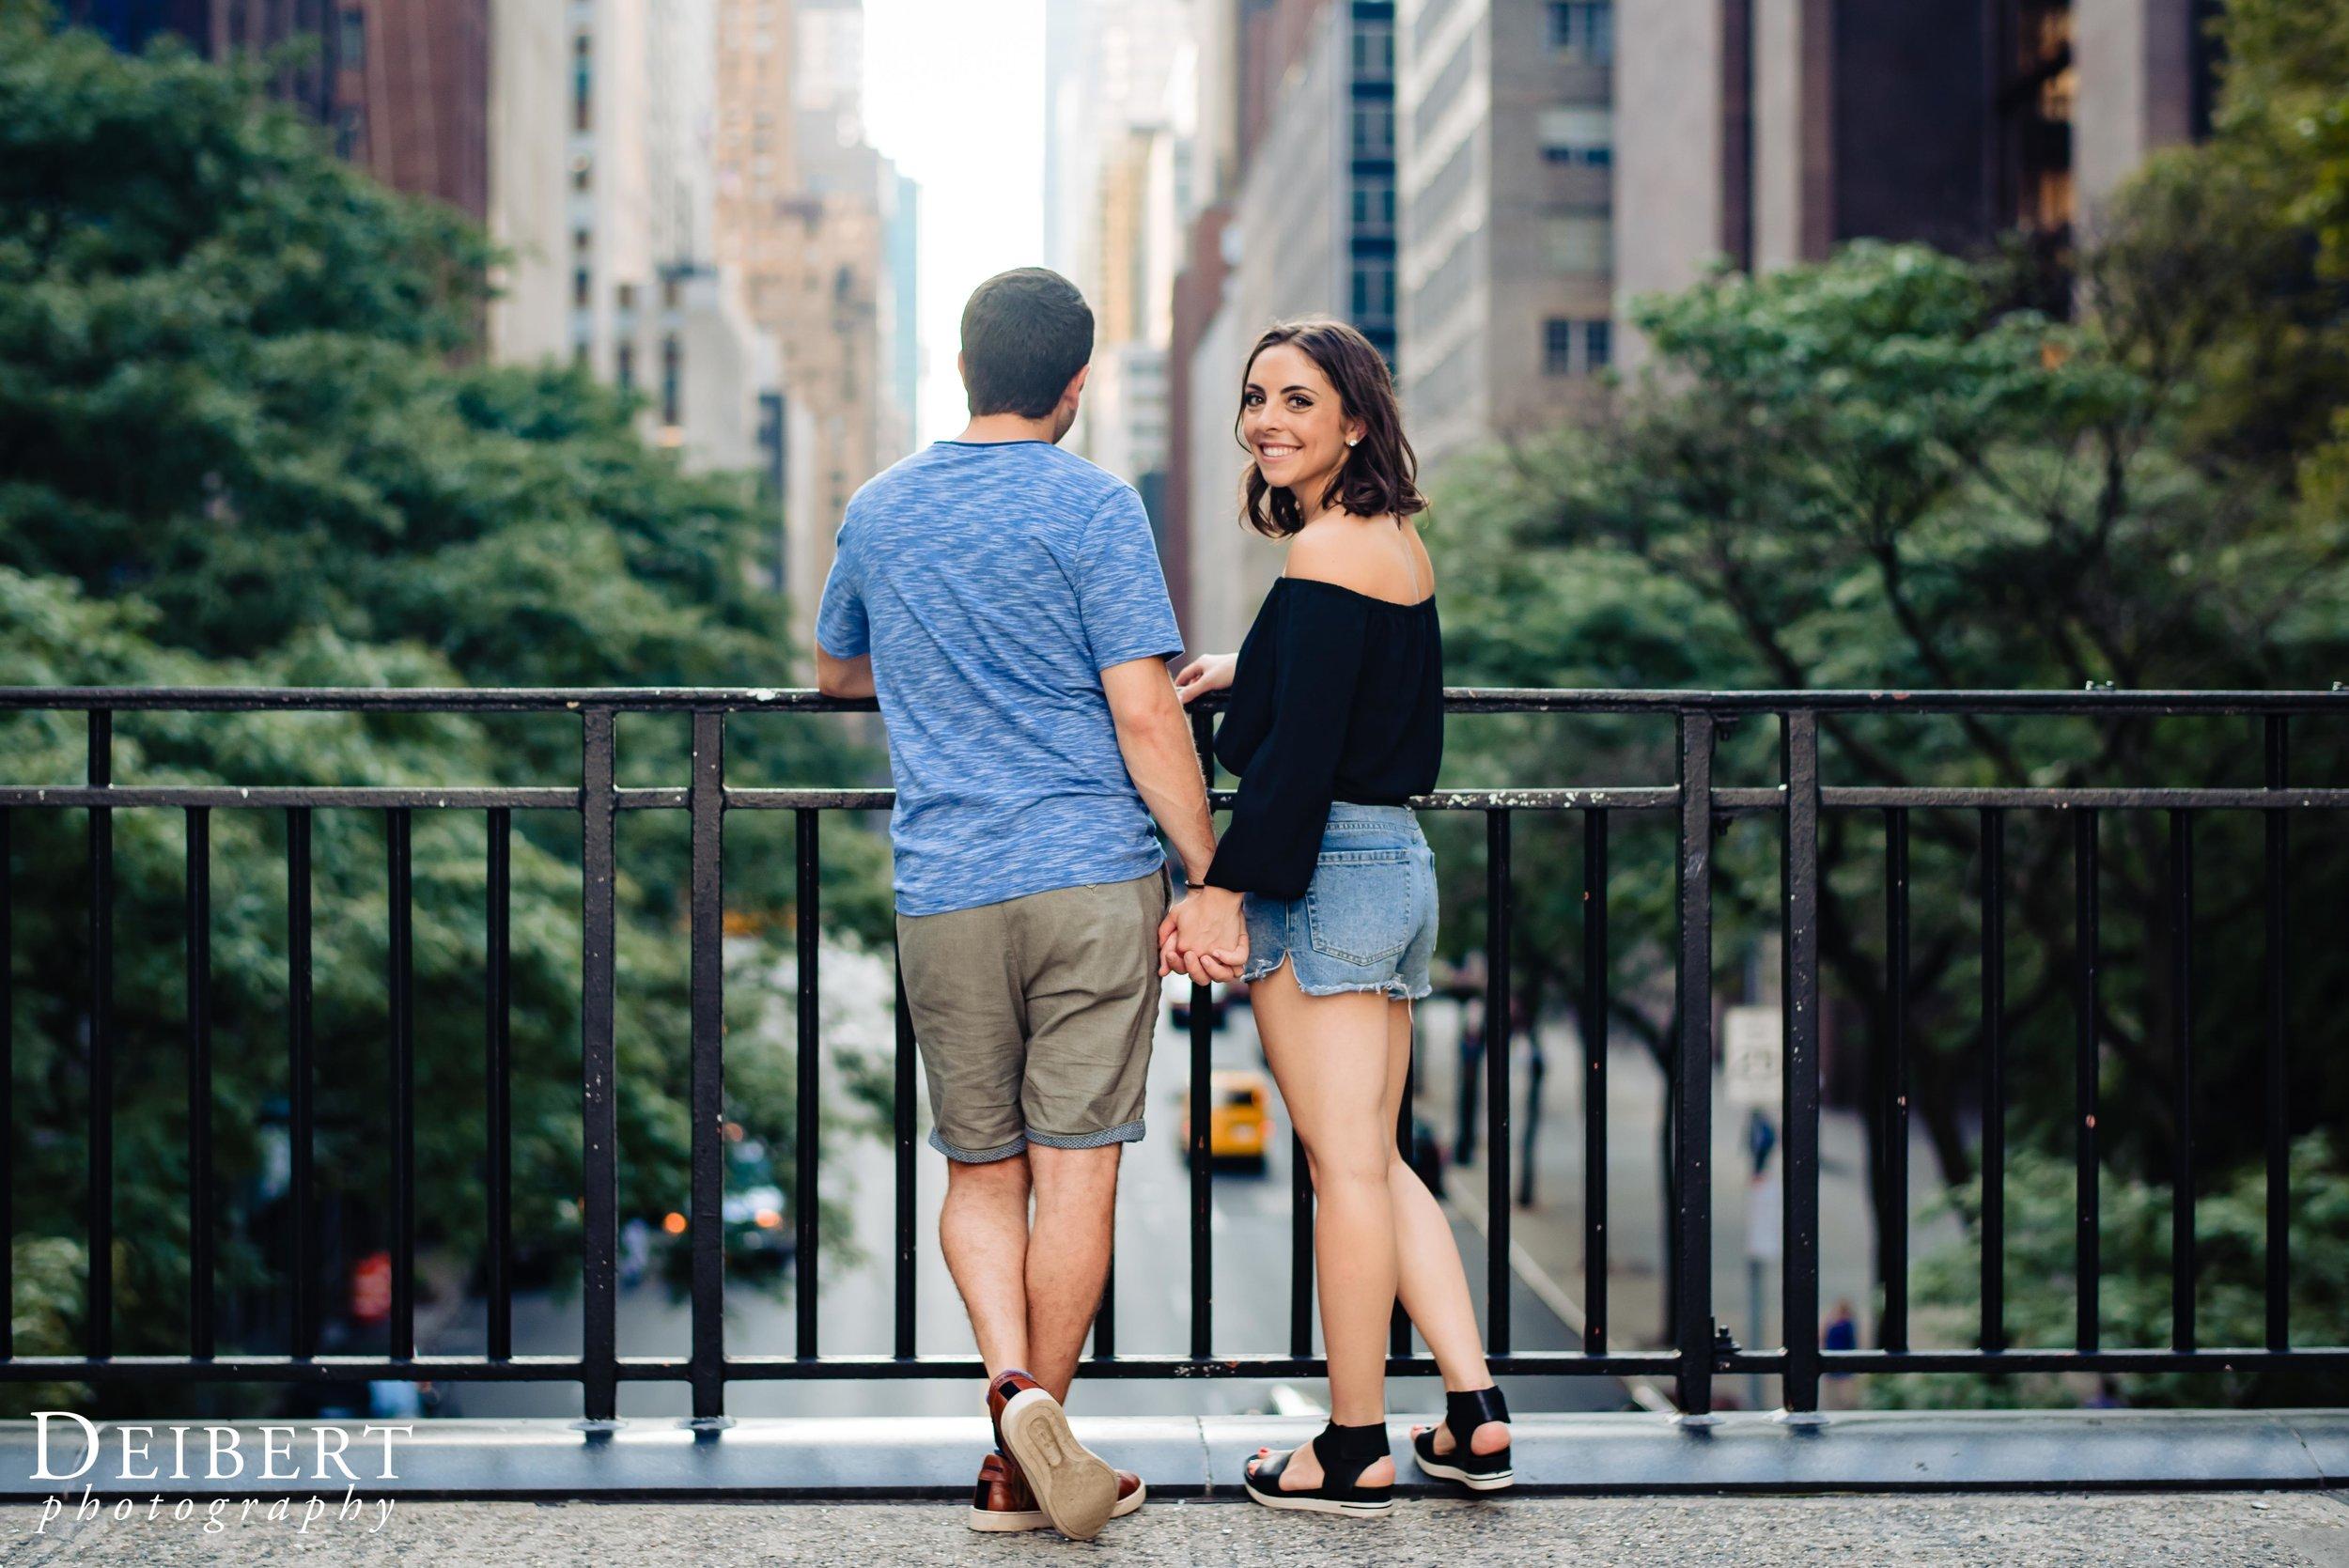 NYC_Tudor City_Sutton Place_Engagement-16.jpg